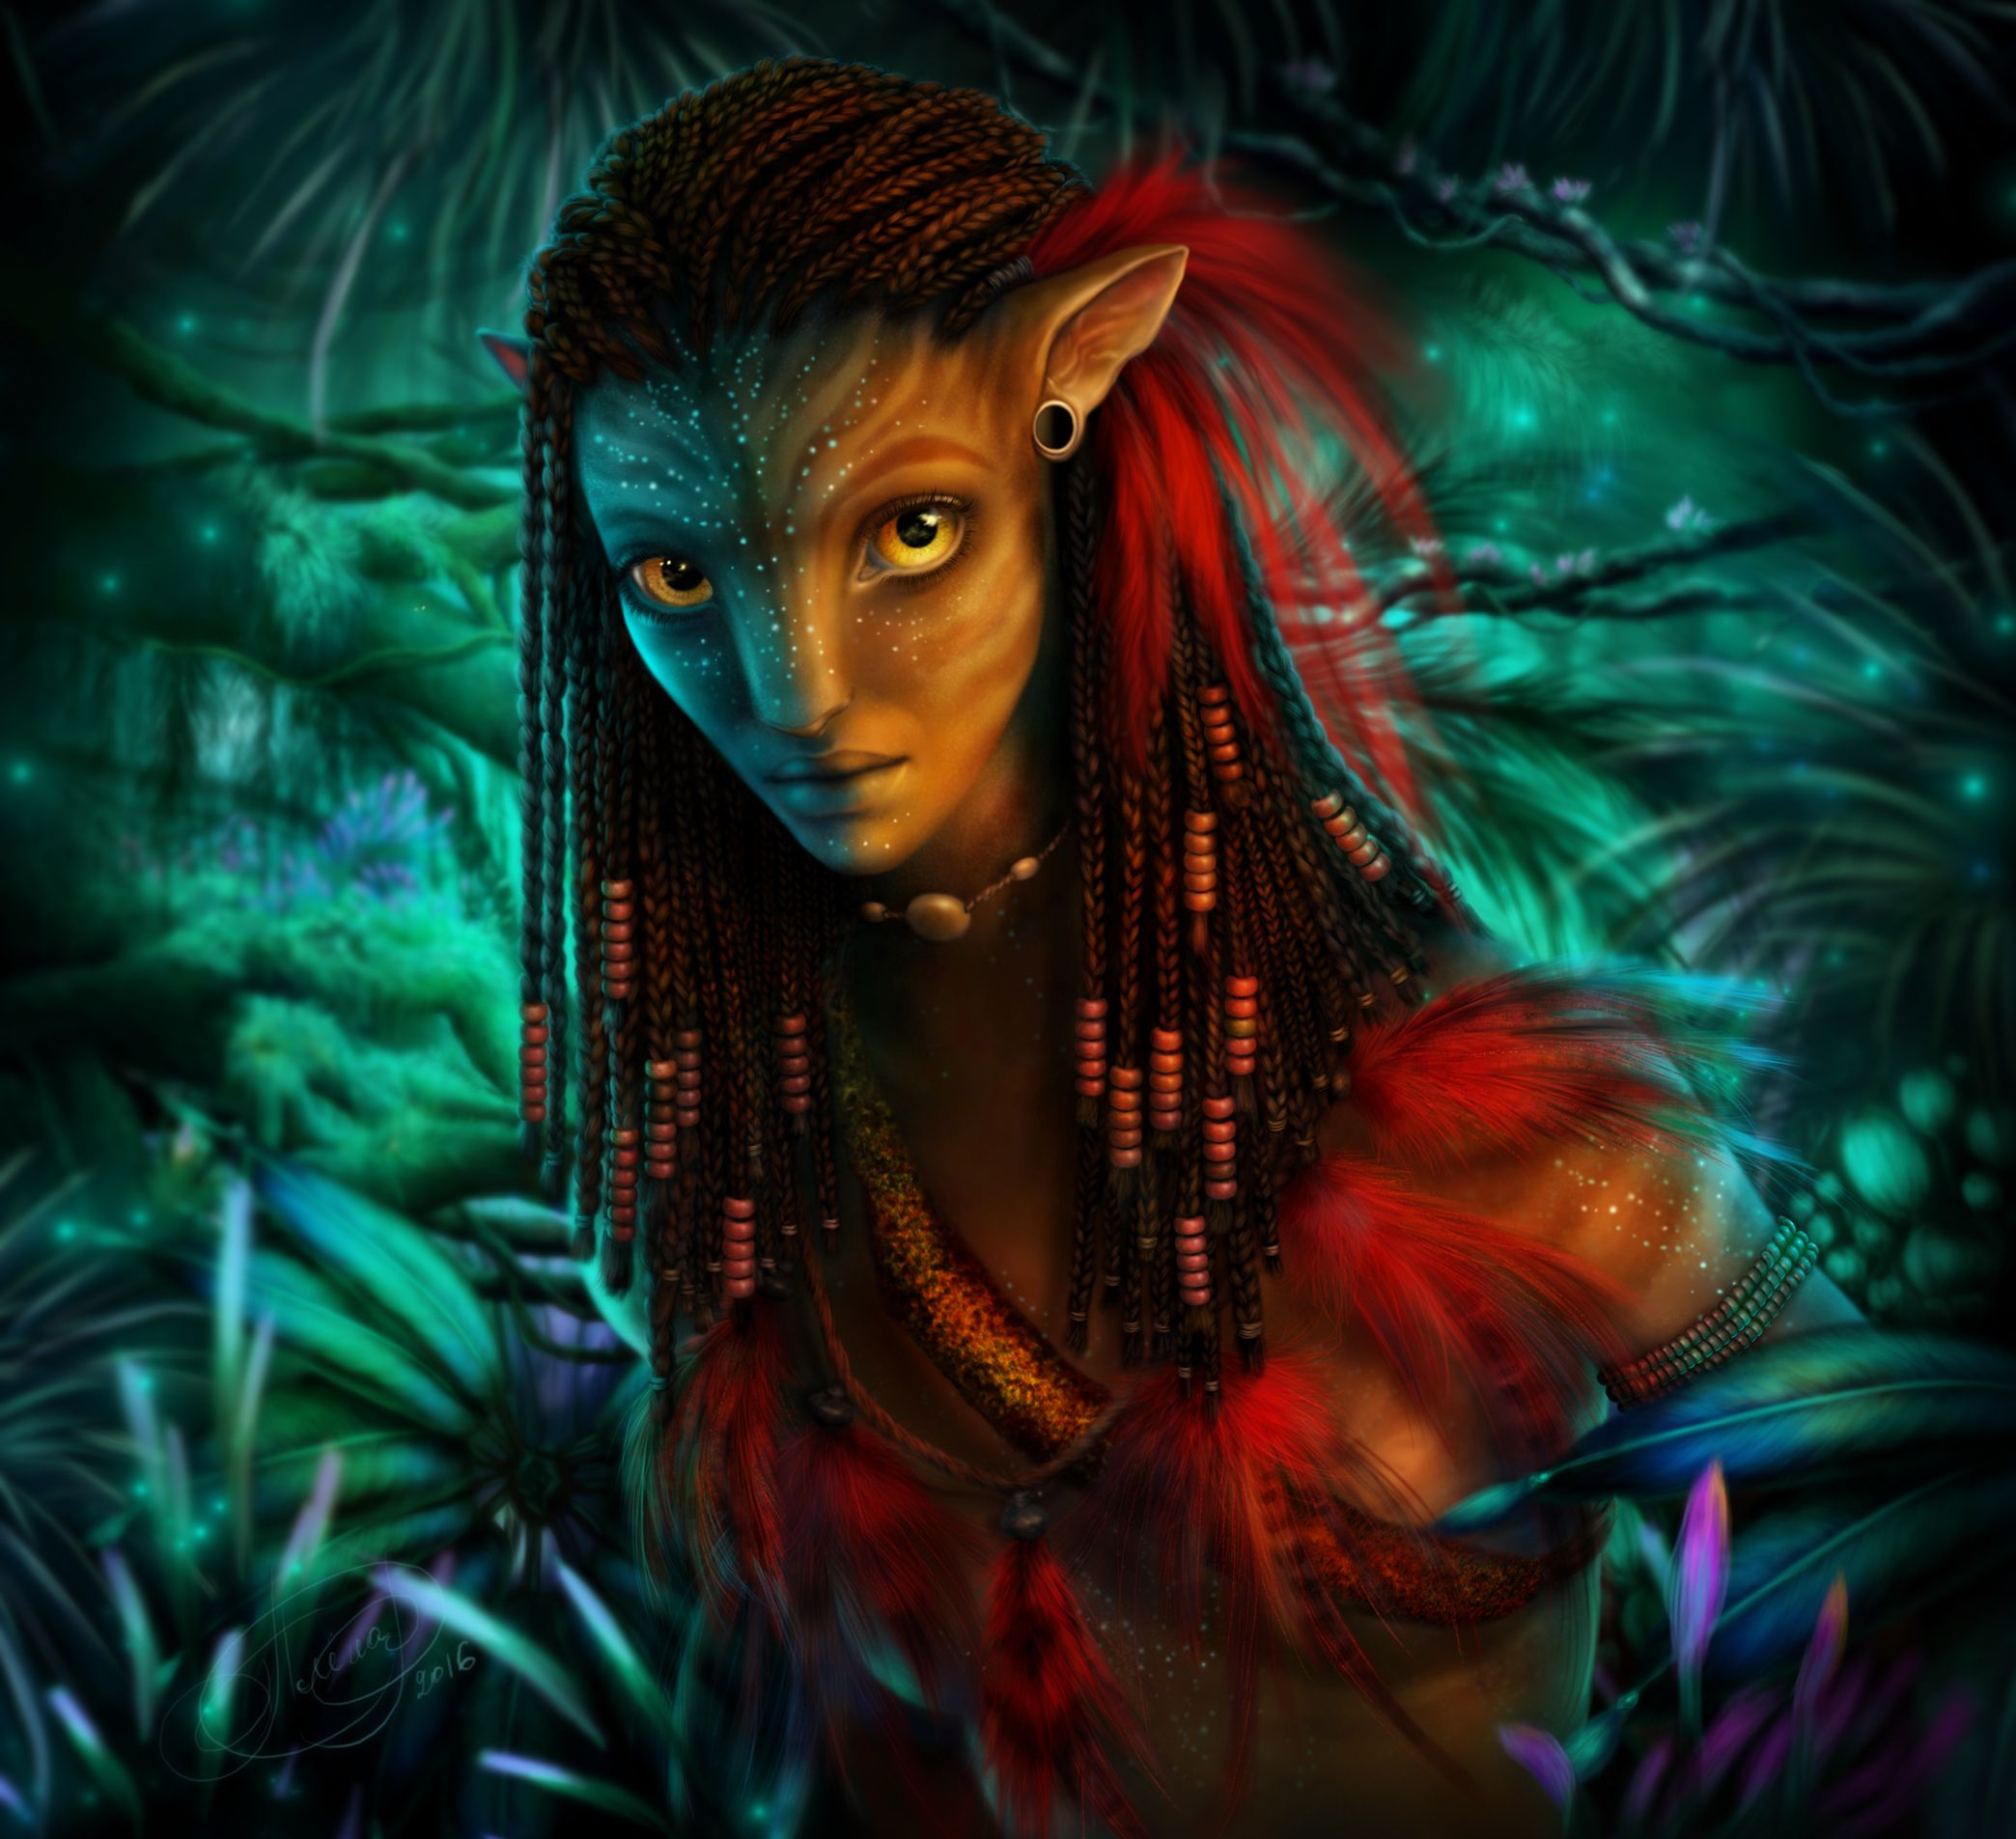 108 Best Avatar The Movie Images On Pinterest: Best Film Avatar Images On Pinterest